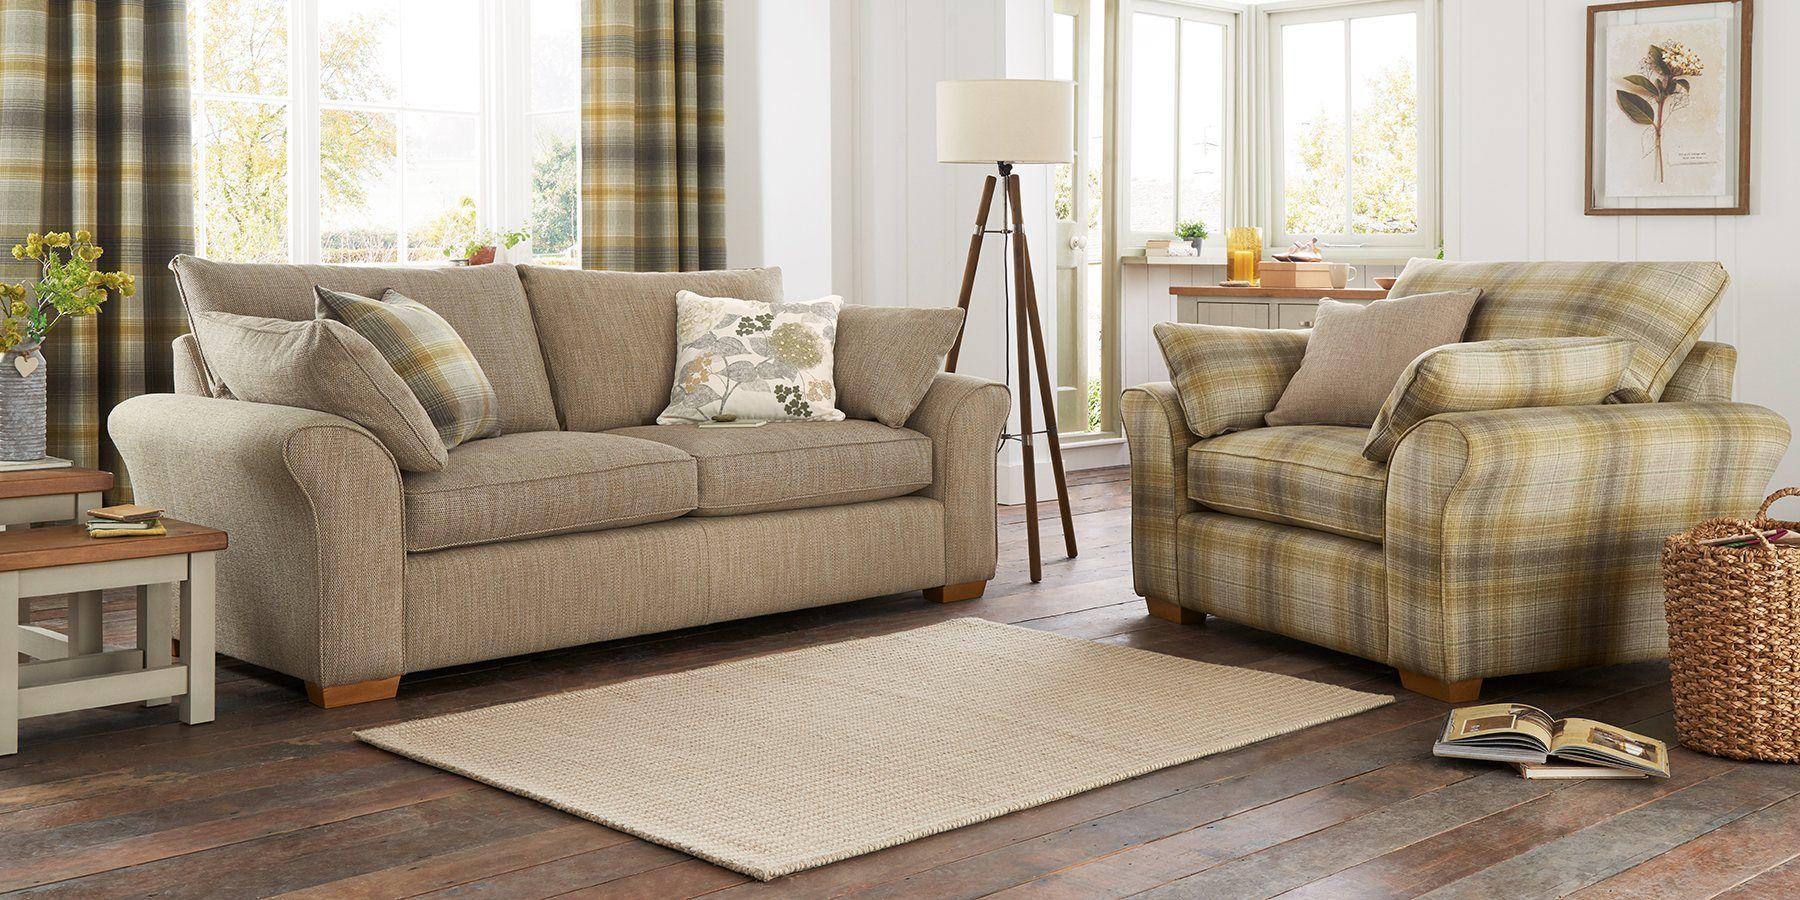 Buy Ashford Large Sofa (3 Seats) Soft Brushed Herringbone Stone Low Turned    Light From The Next UK Online Shop | Home   Lounge | Pinterest | Large ...